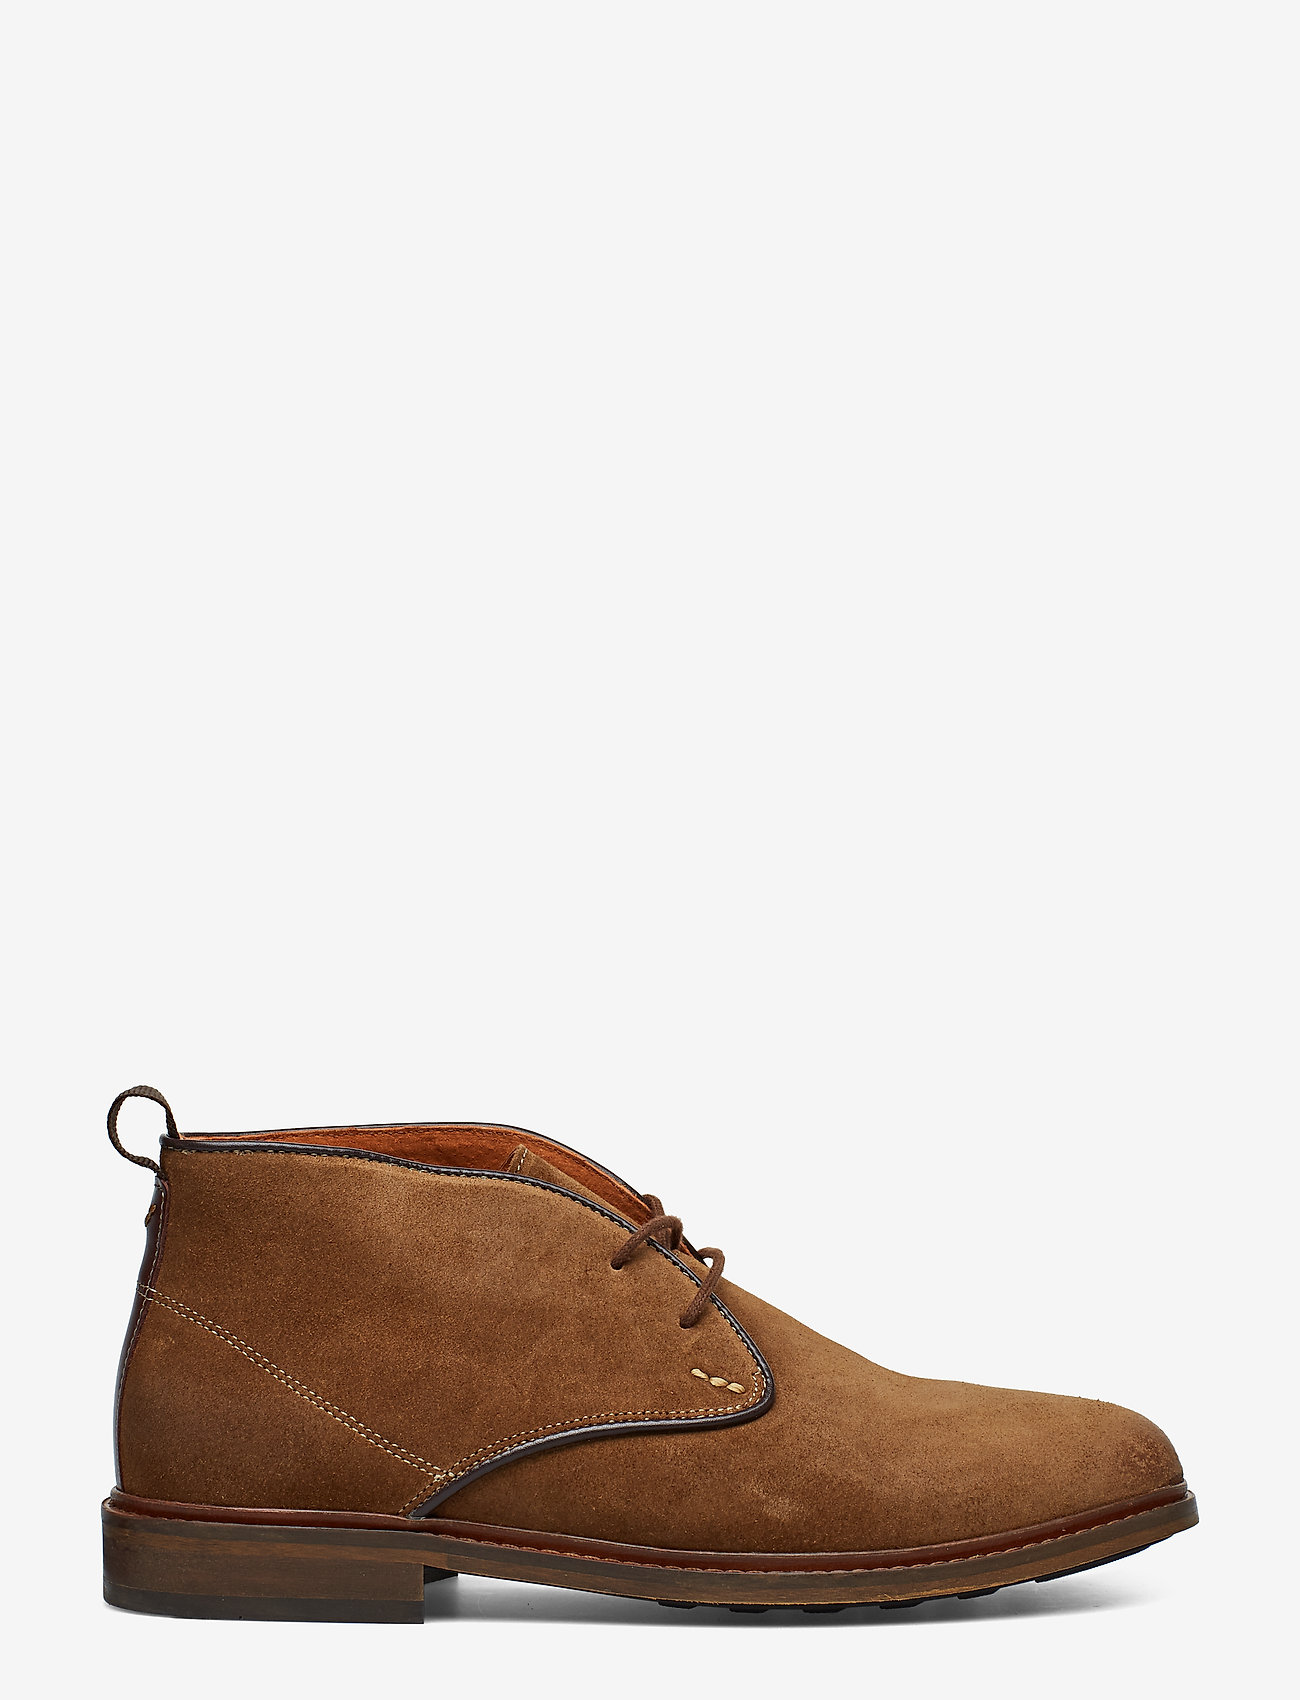 Shoe The Bear - DALTON S - desert boots - brown - 1